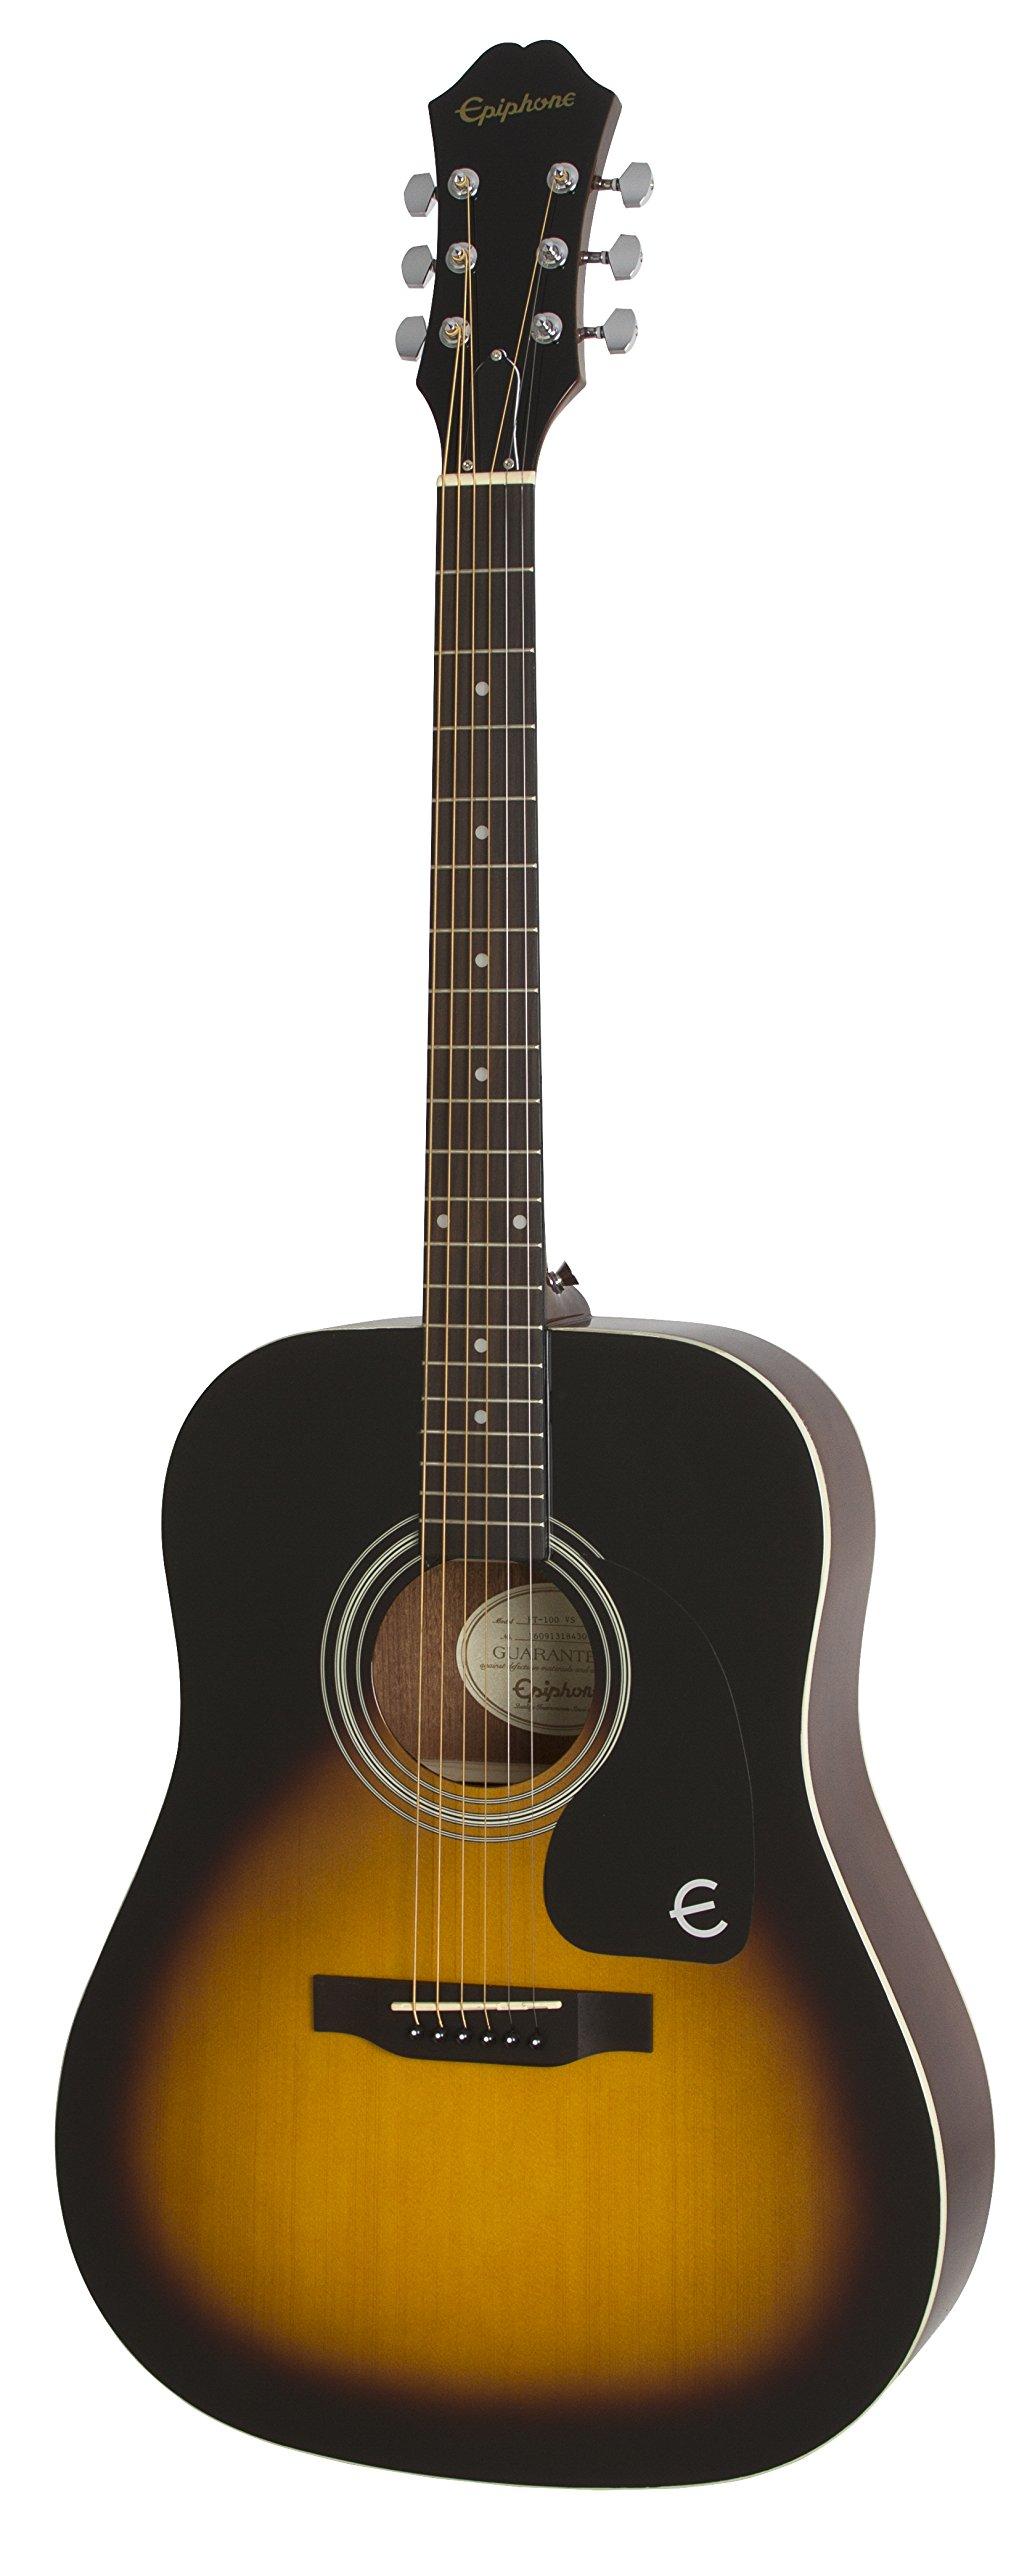 Epiphone FT-100 Acoustic Guitar, Vintage Sunburst by Epiphone